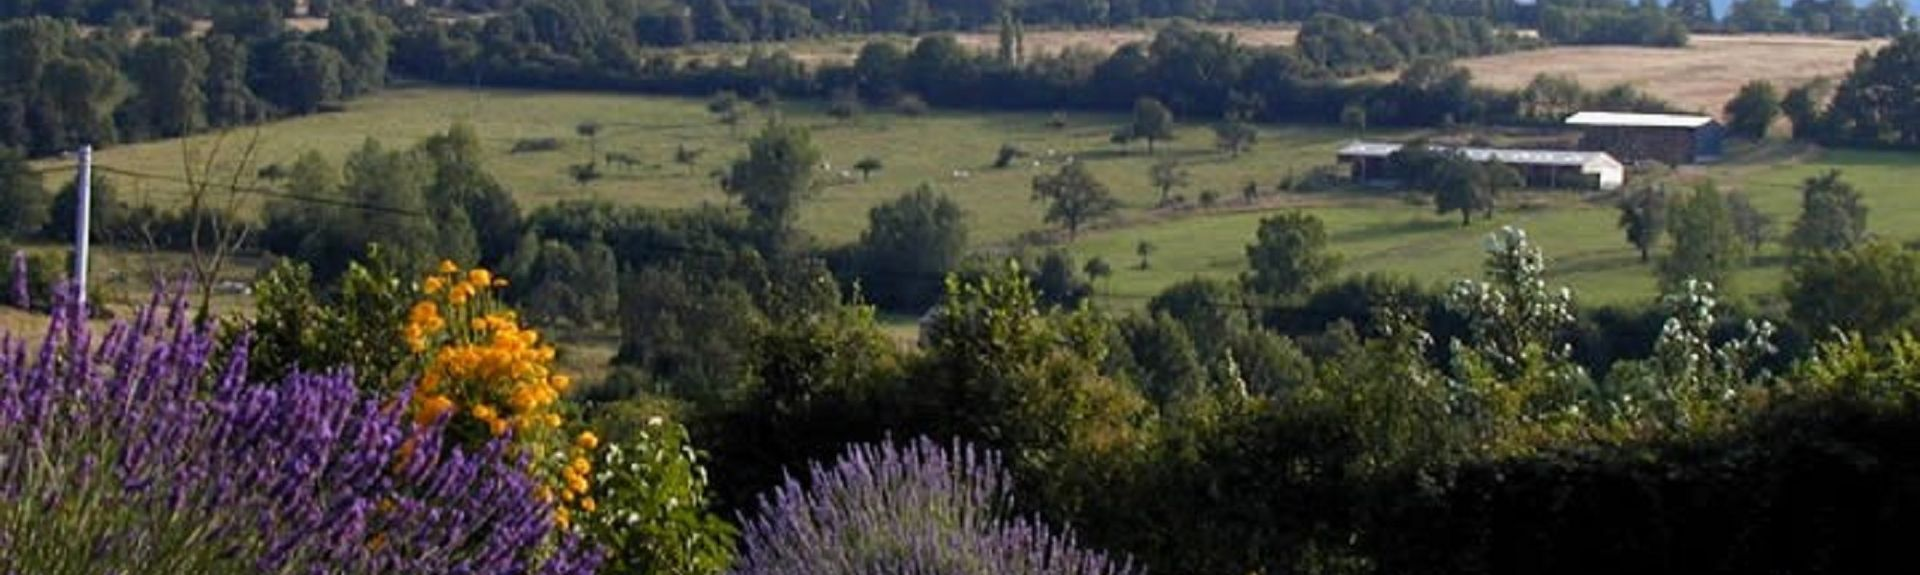 Courcy, Calvados (department), France